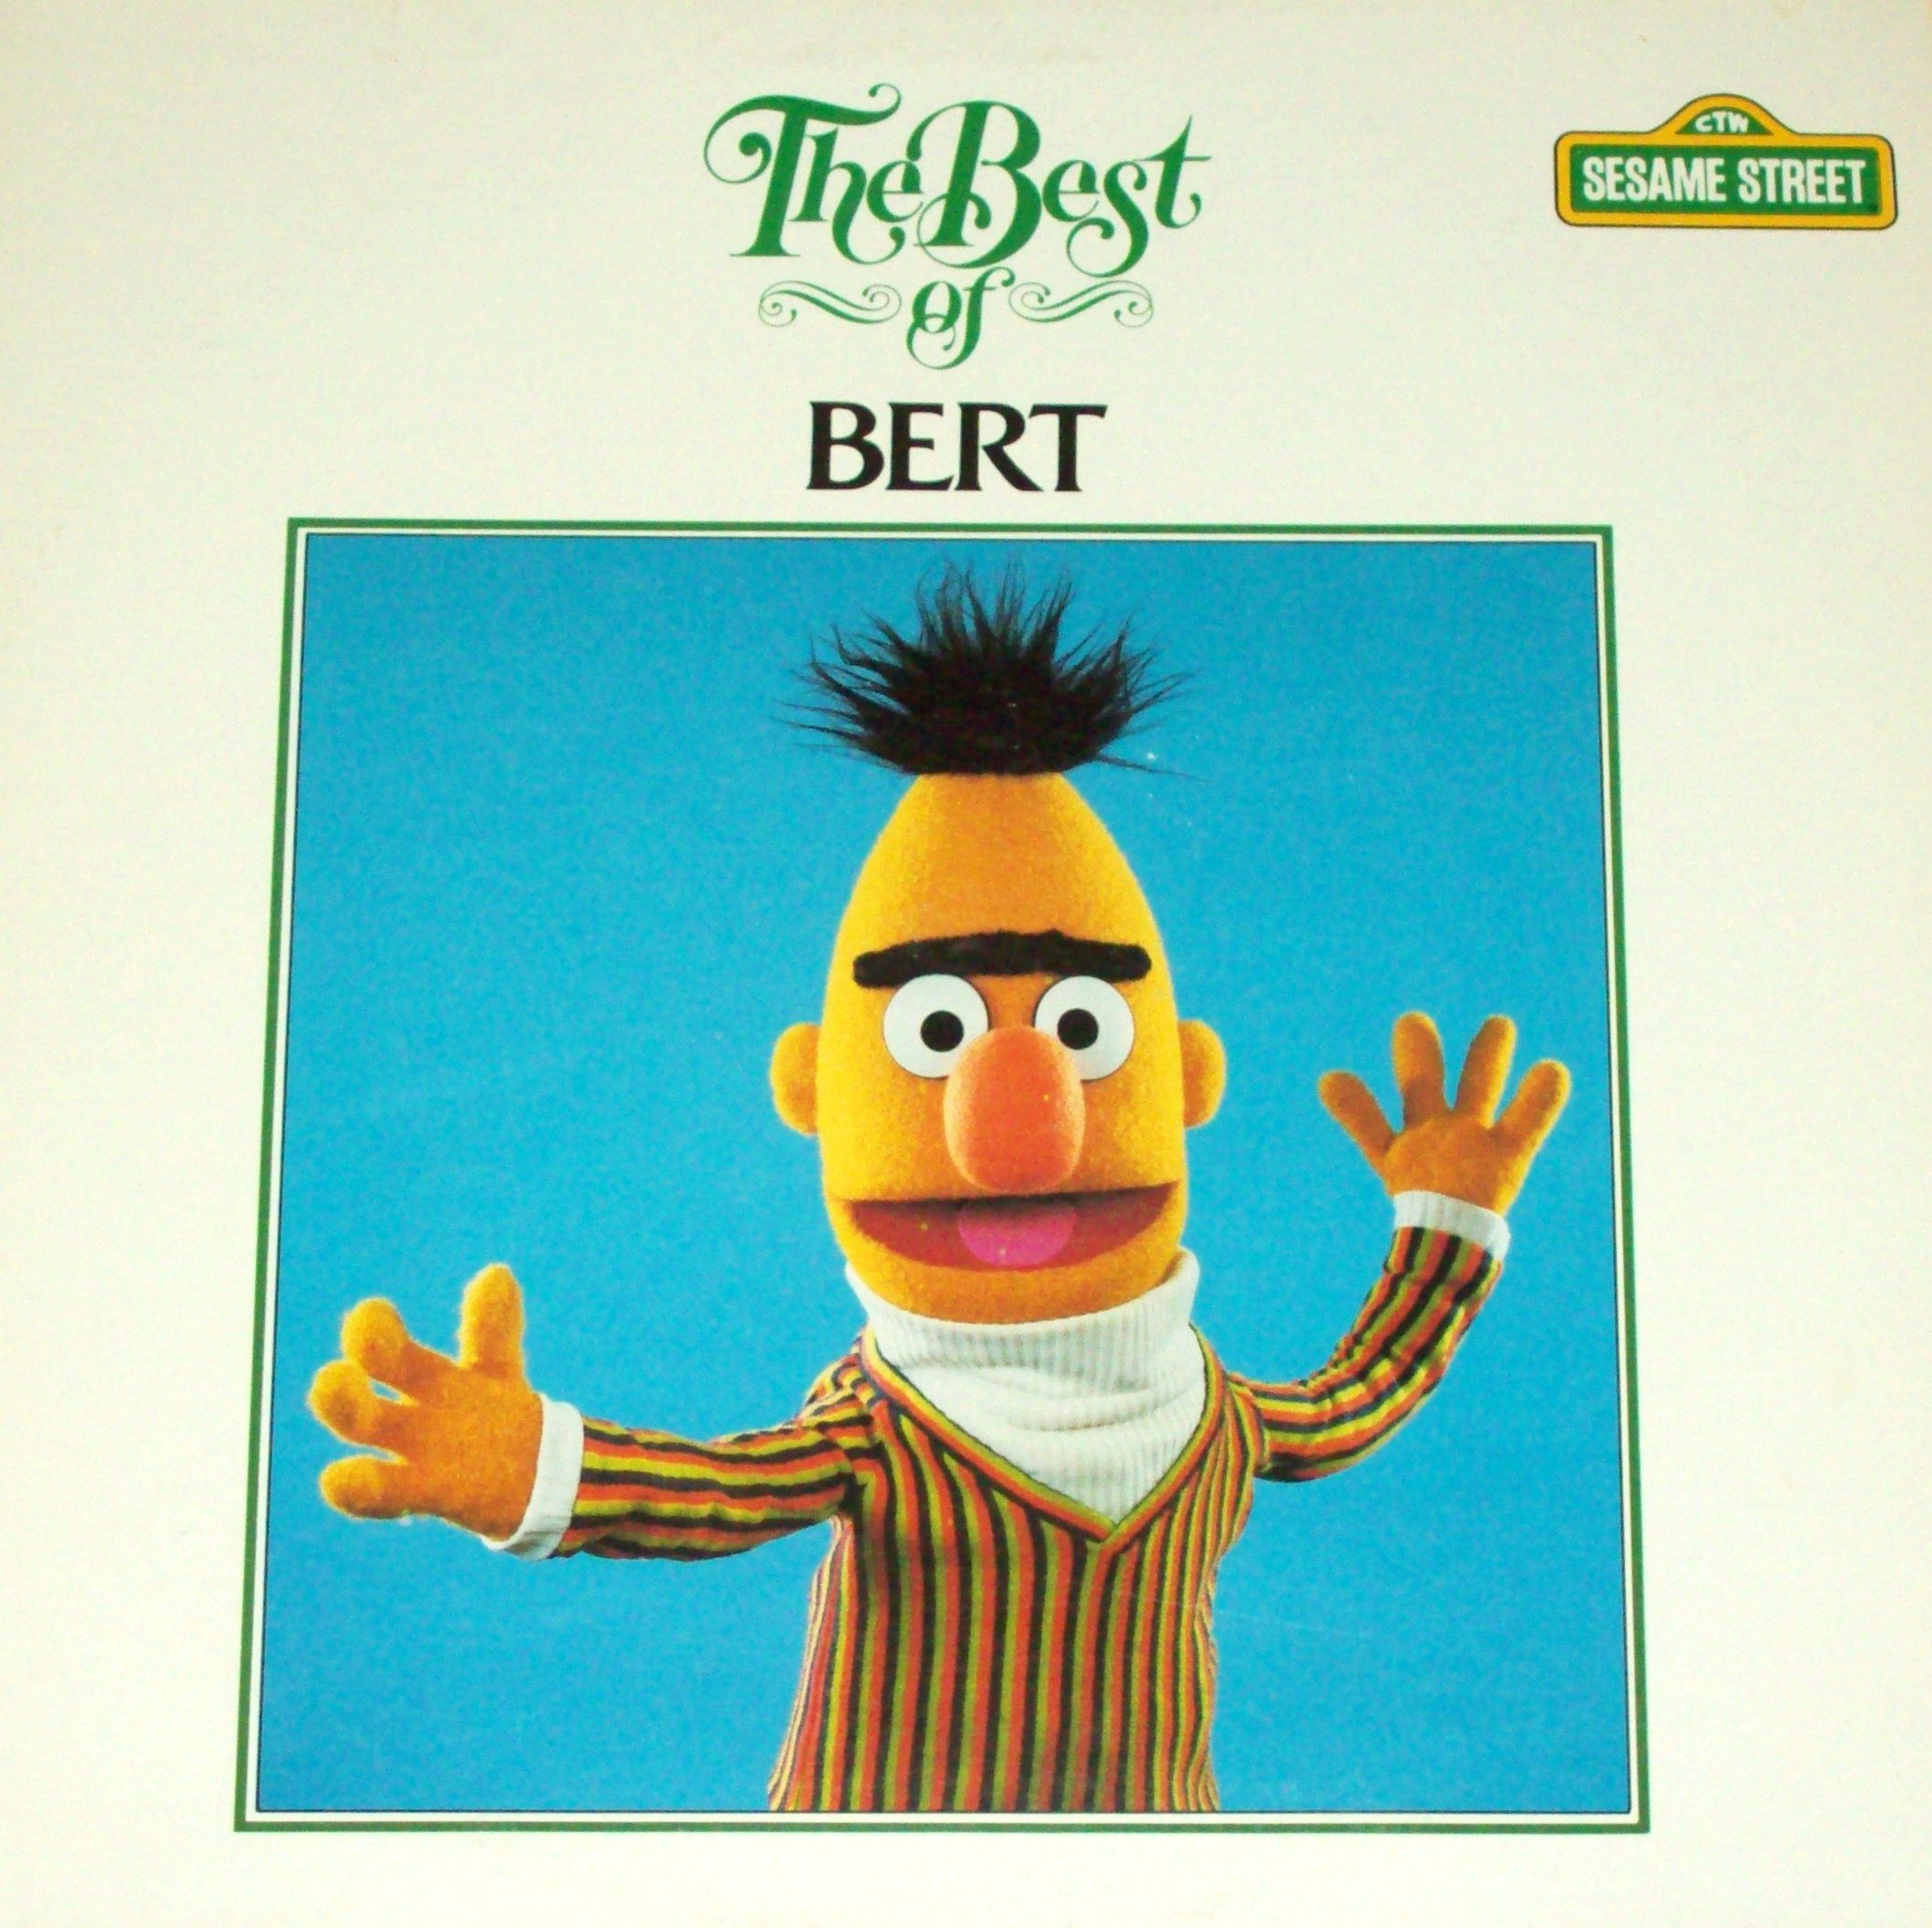 Bert & ErnieSesame StreetJim HensonFrank Oz